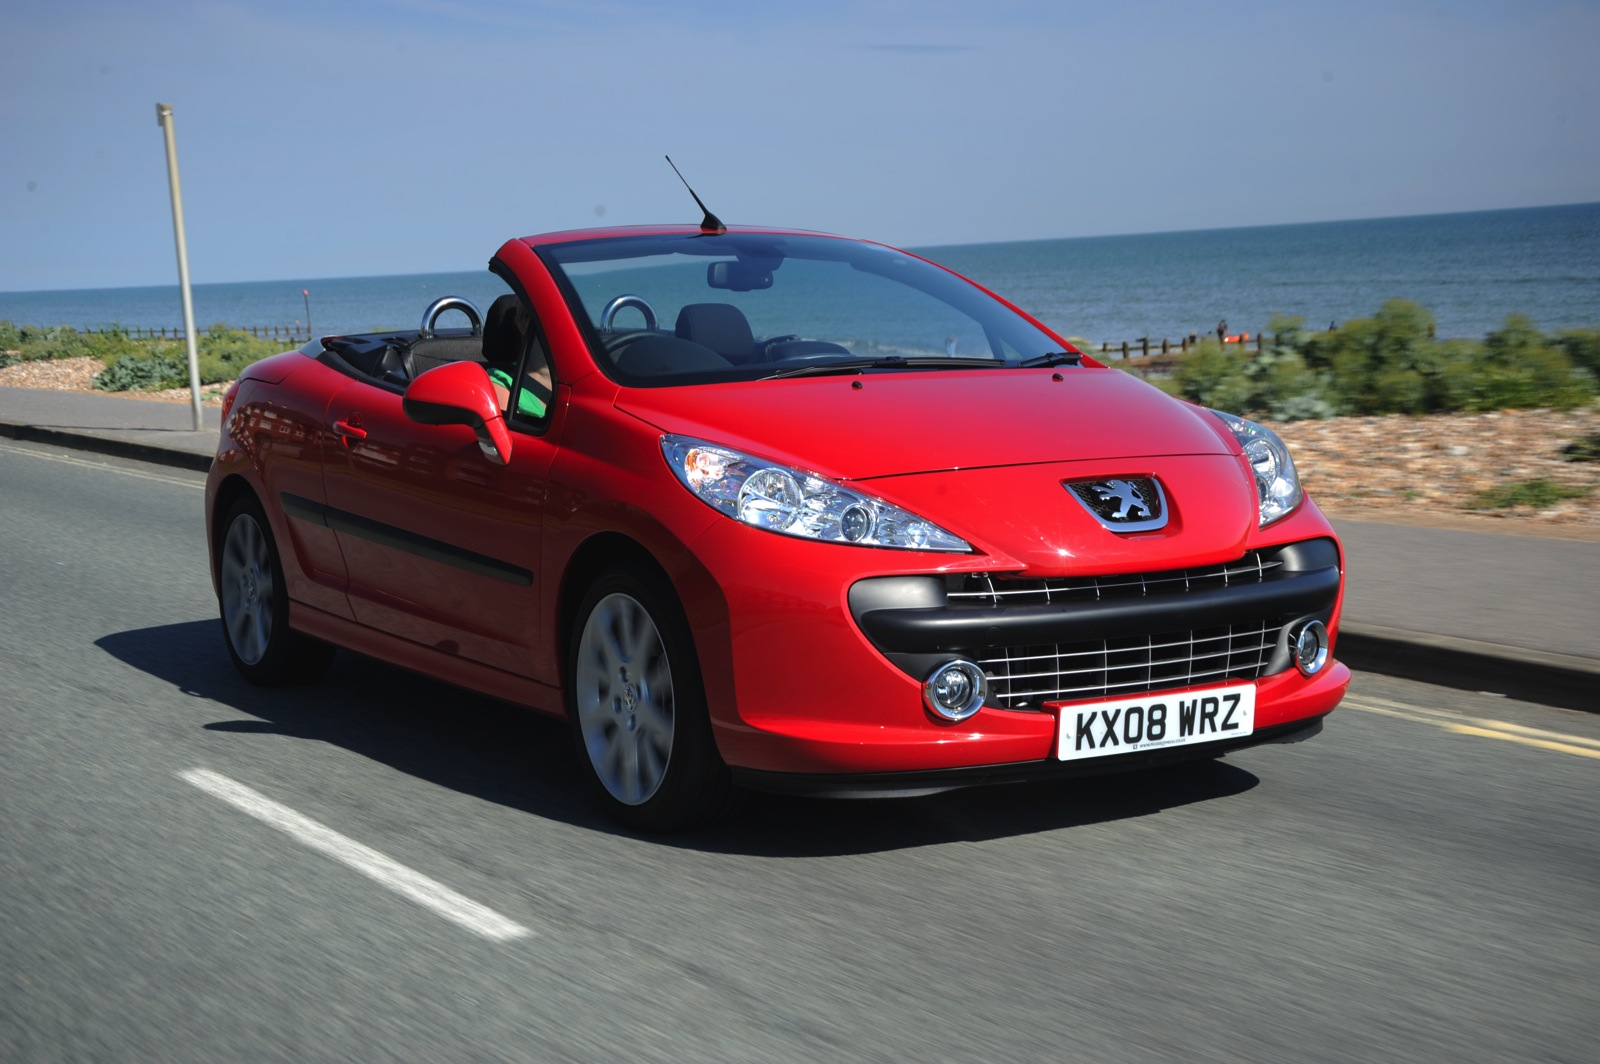 Peugeot 207 on a seaside road